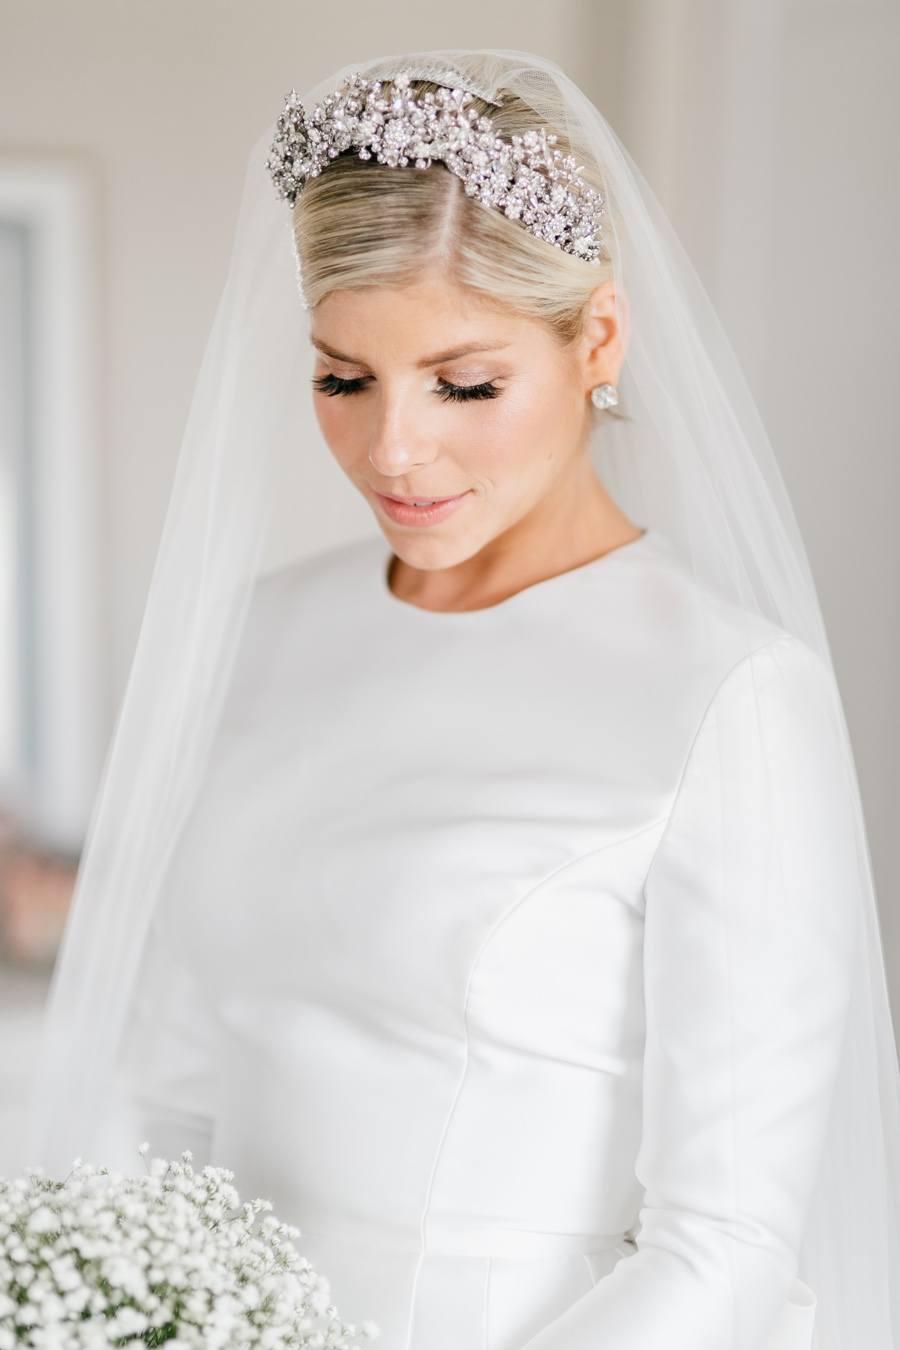 Bride diamond headpiece